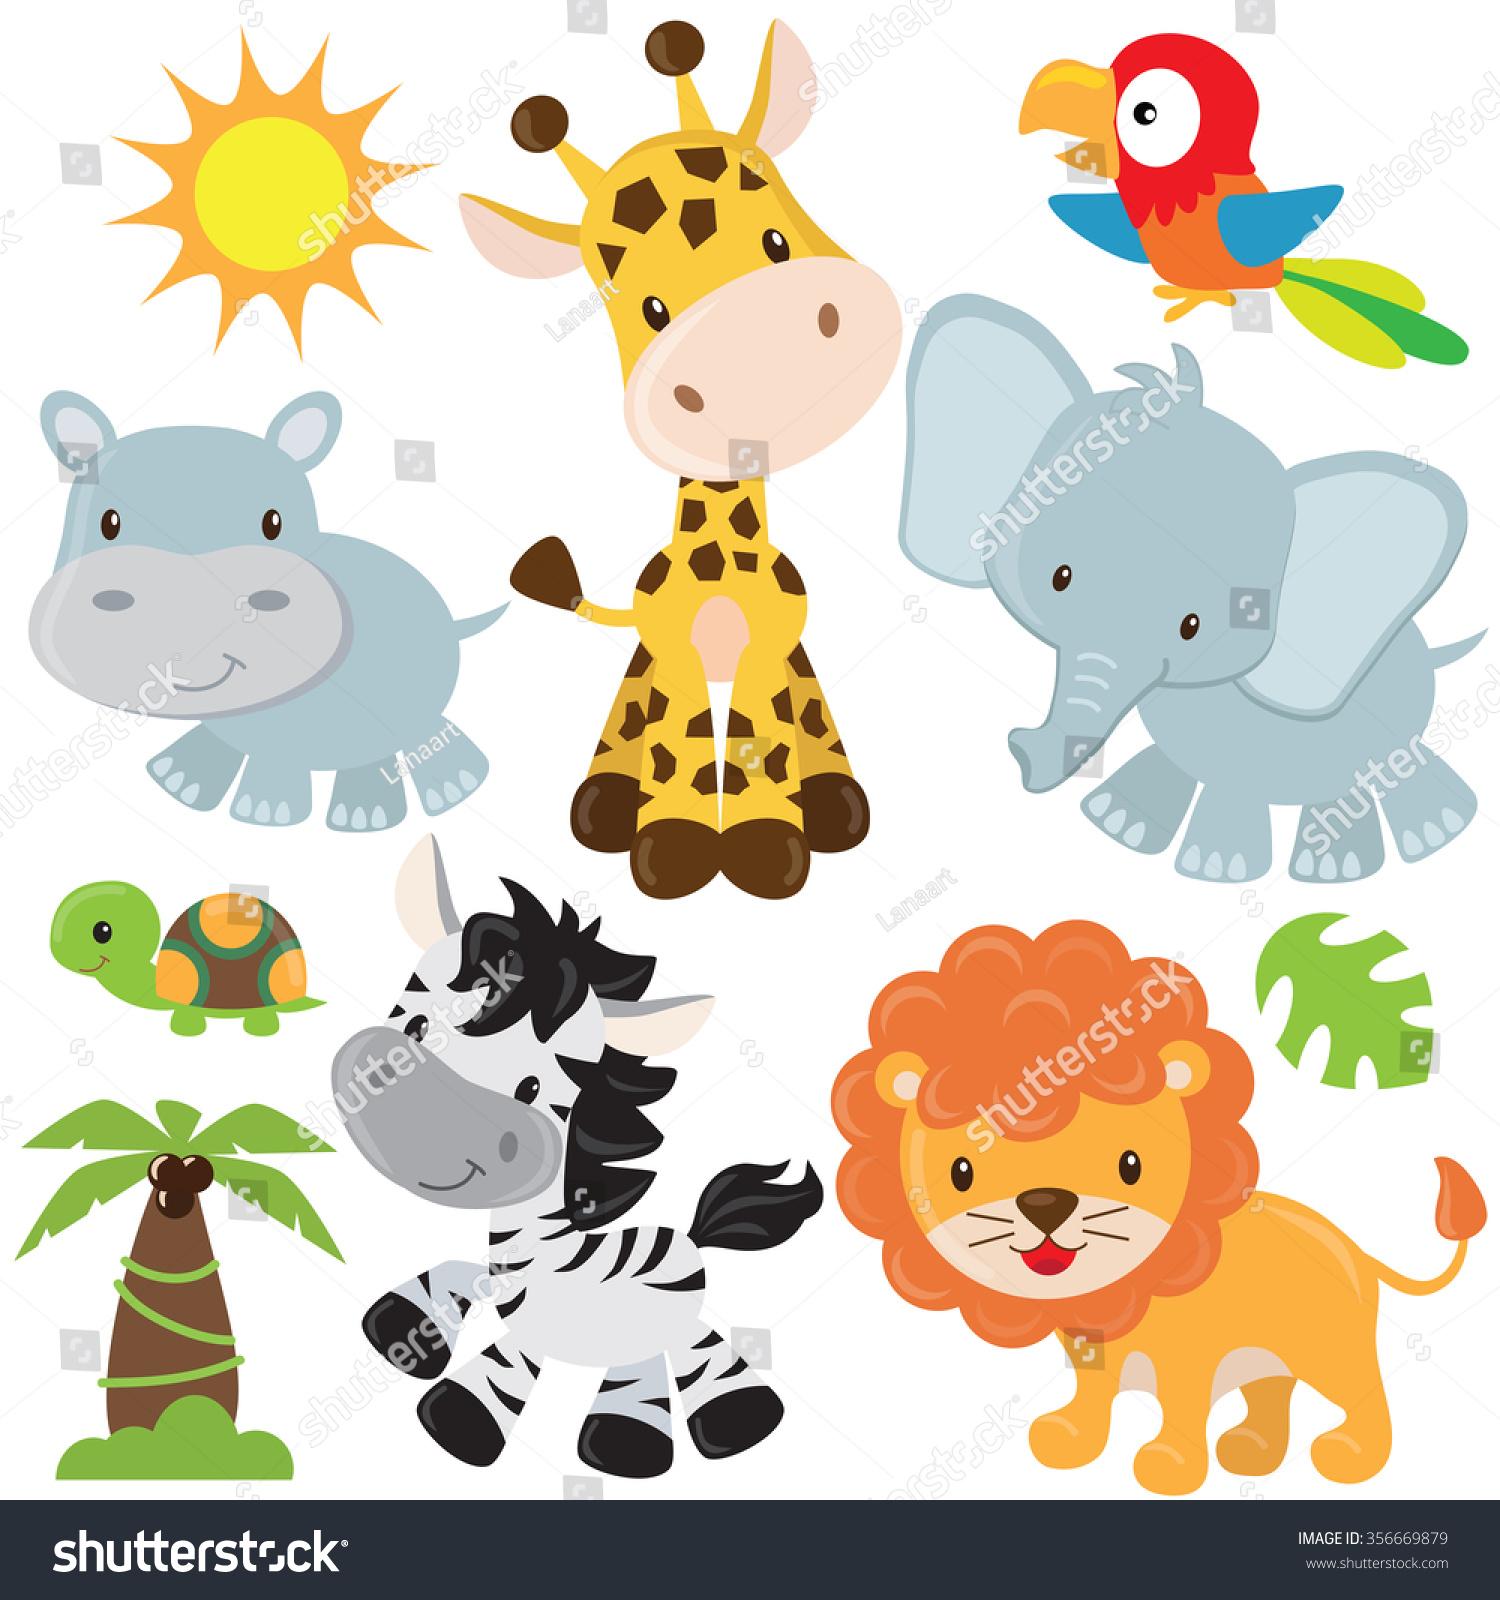 Cute Jungle Animals Vector Illustration Stock Vector